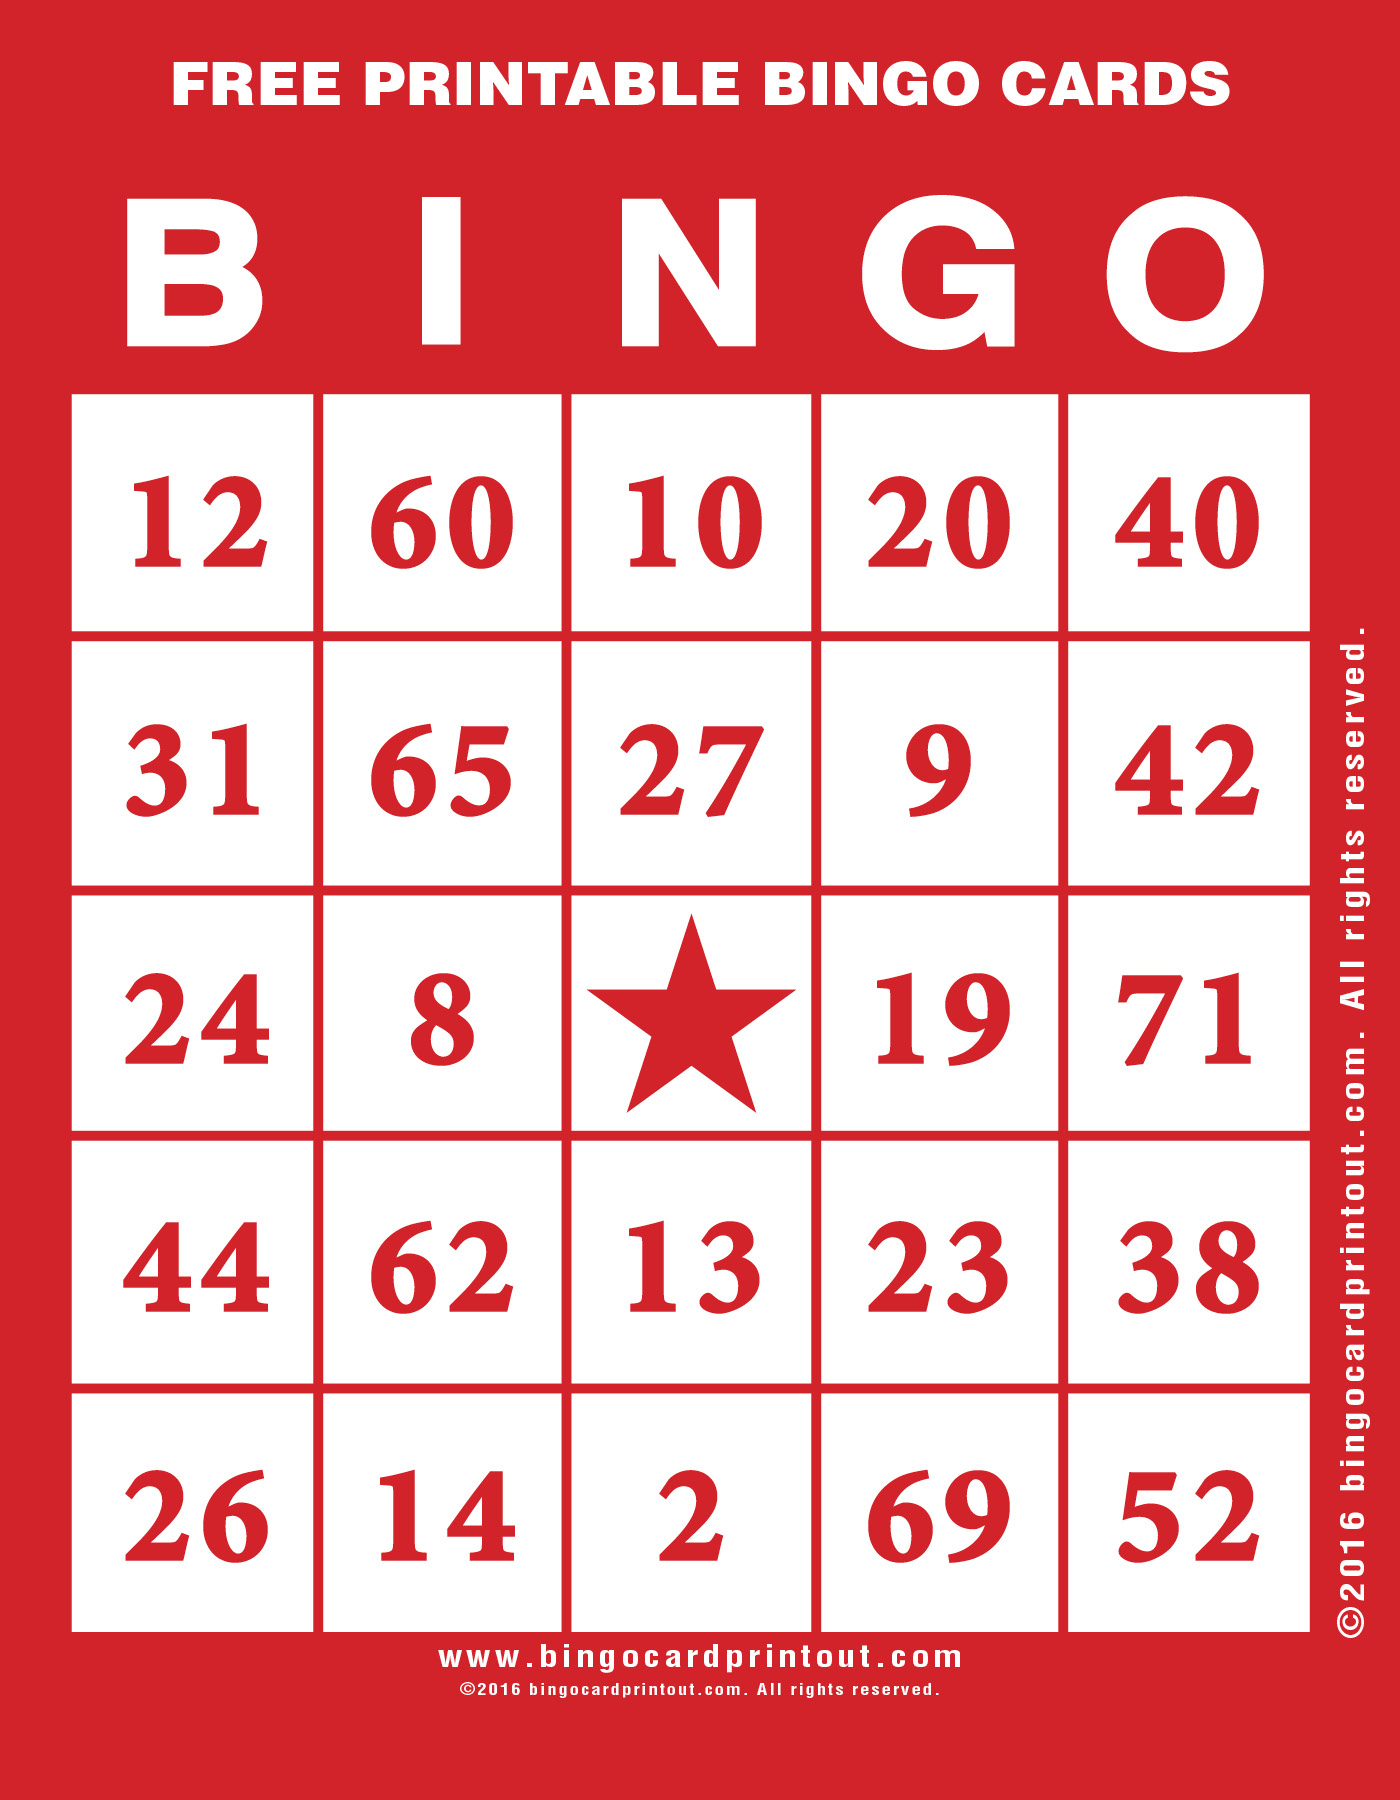 Free Printable Bingo Cards - Bingocardprintout